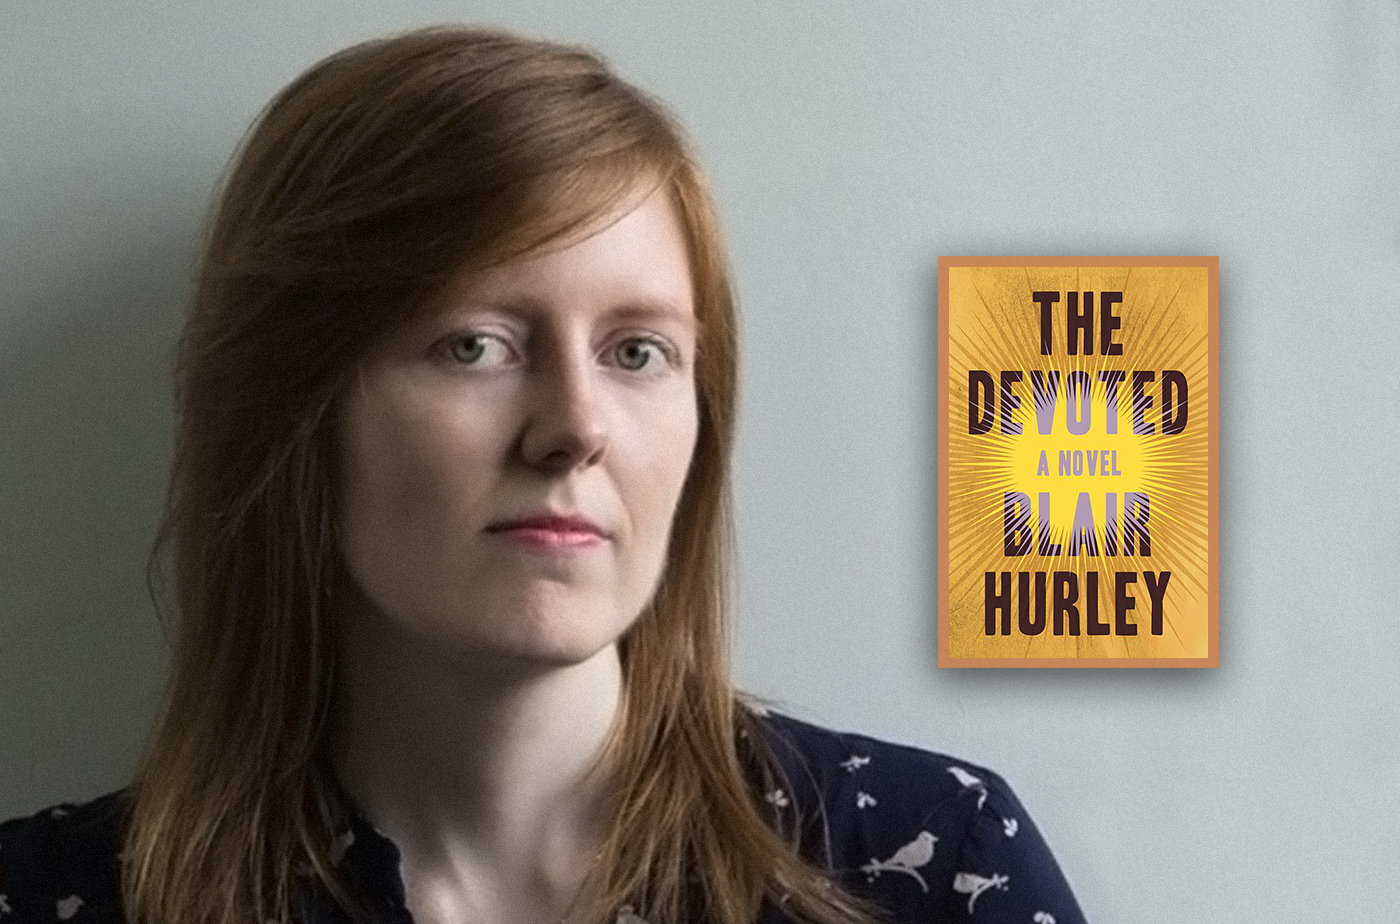 Catapult online classes: Blair Hurley, 6-Week Online Fiction Workshop: Launching into Your Novel, Fiction, Novel, Workshop